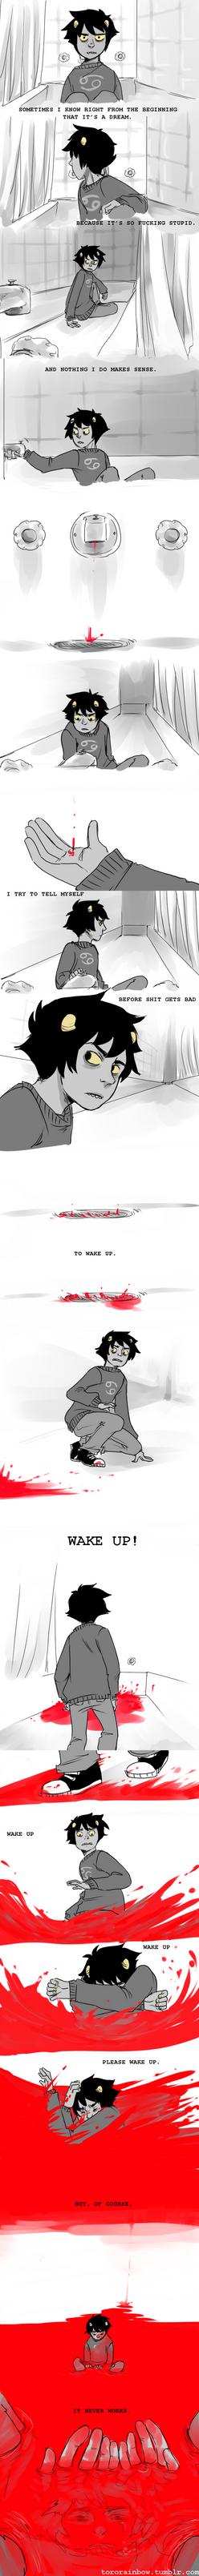 hemophobia by ryounkura